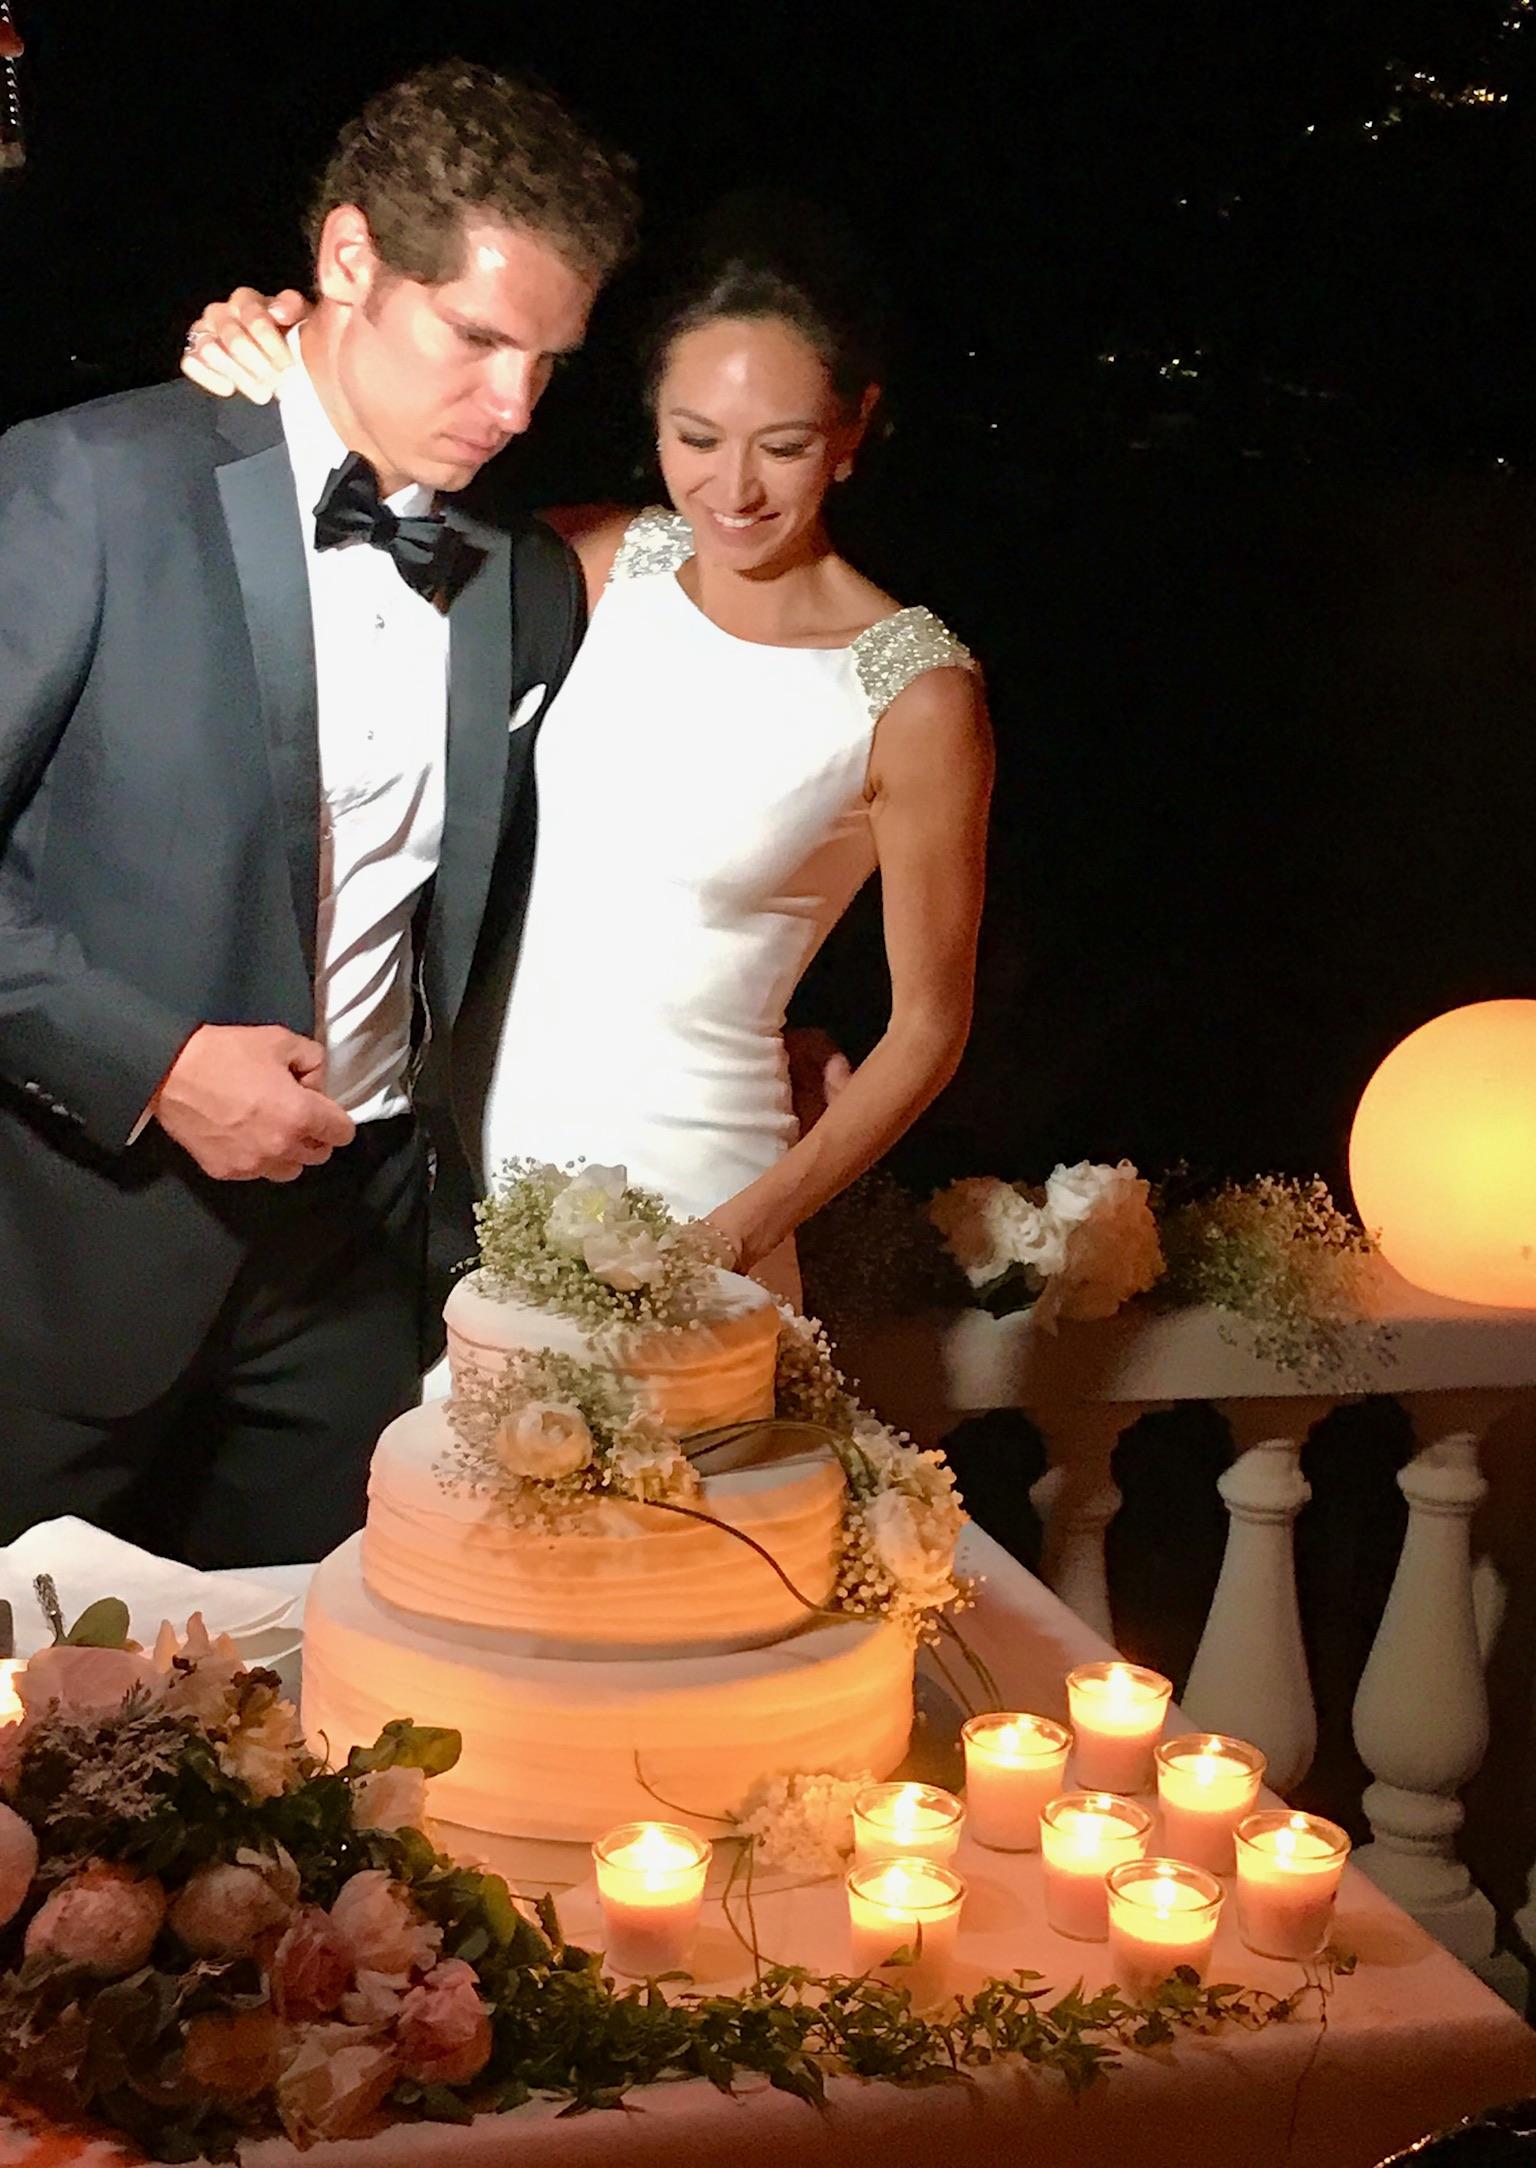 http://www.weddingamalfi.com/wp-content/uploads/Nathalie-and-Benjamin-wedding-in-Positano-28.jpg